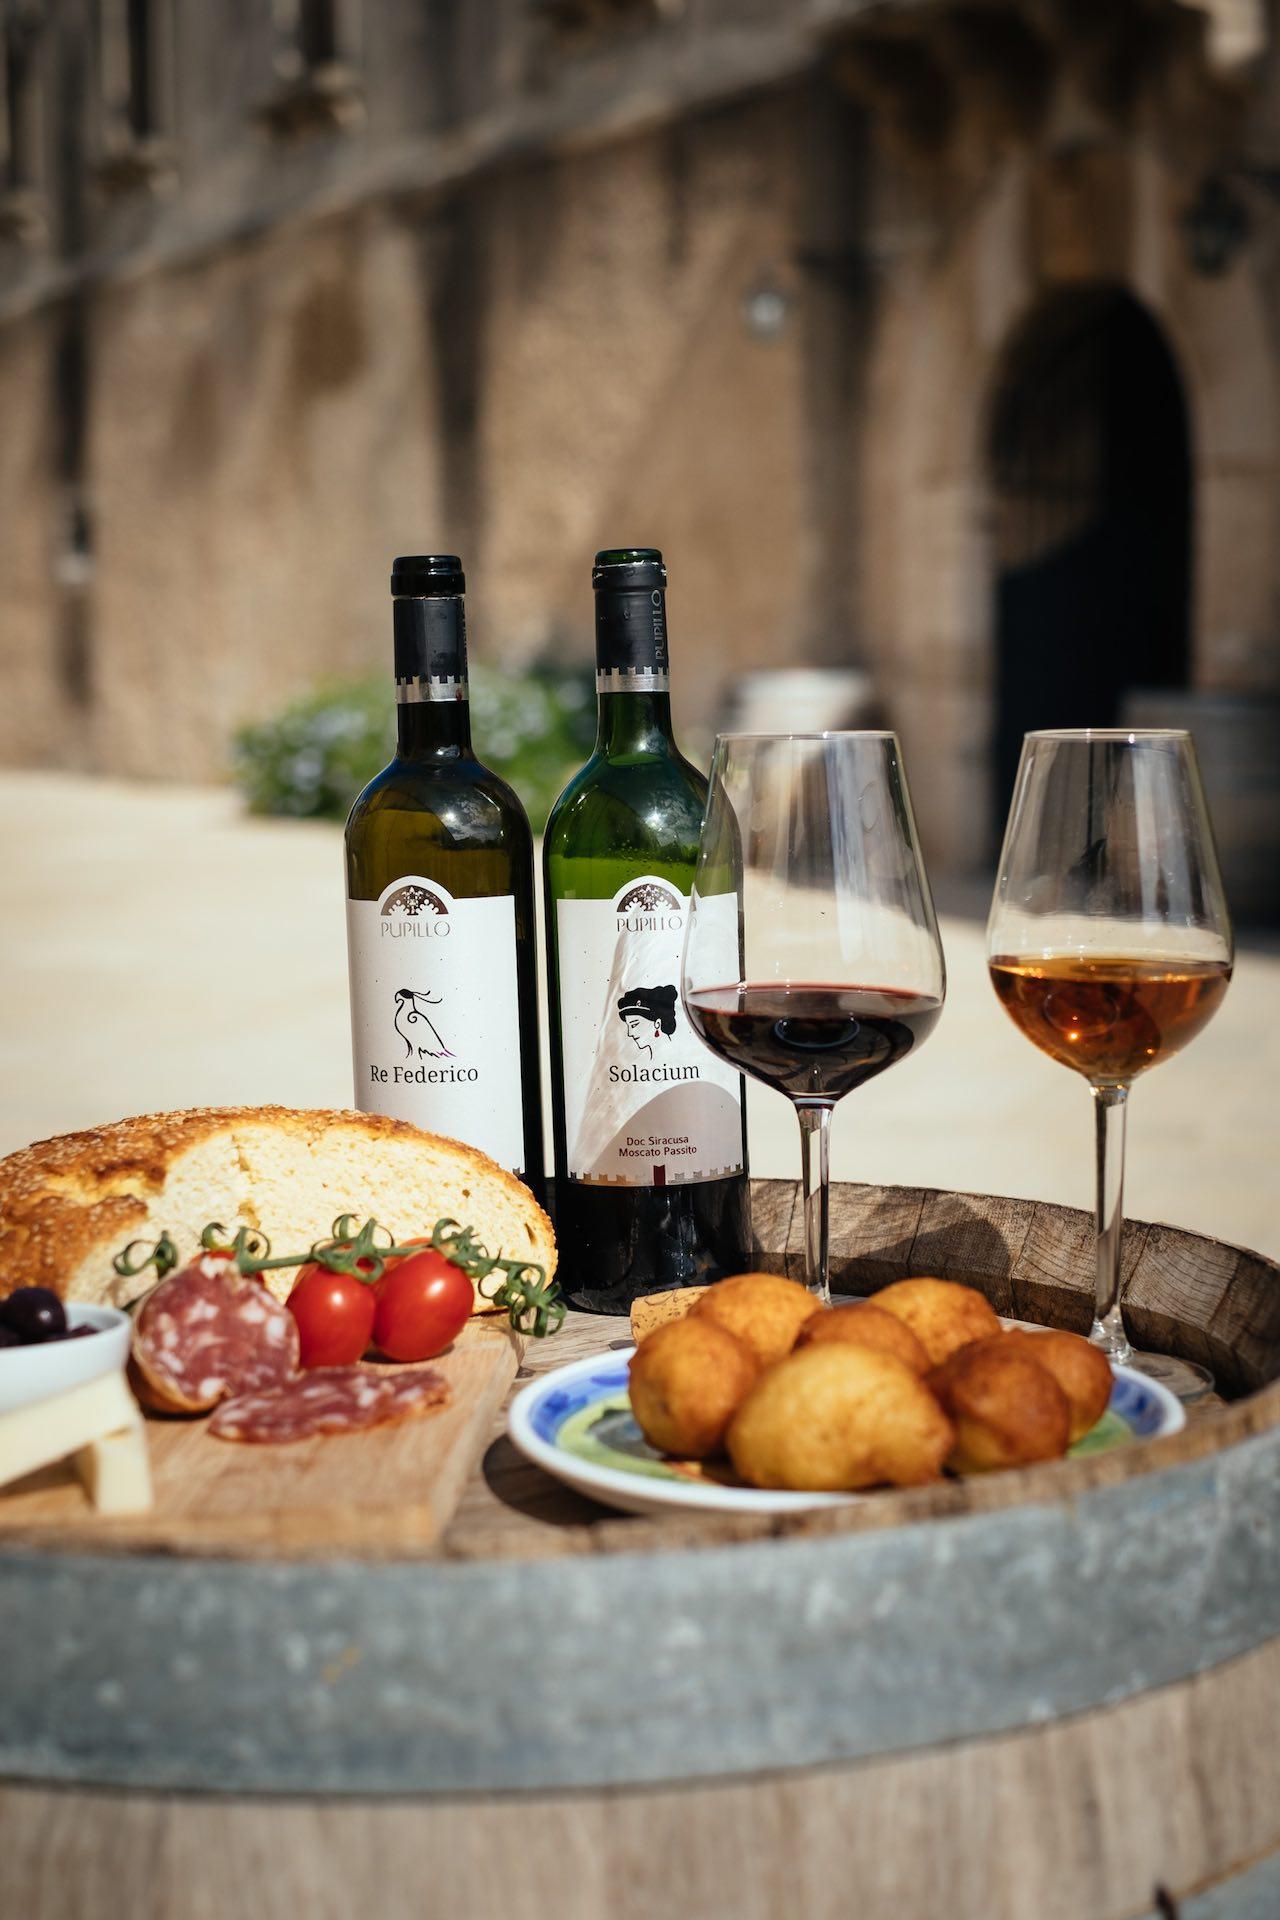 Pupillo Wines Siracusa Sicily